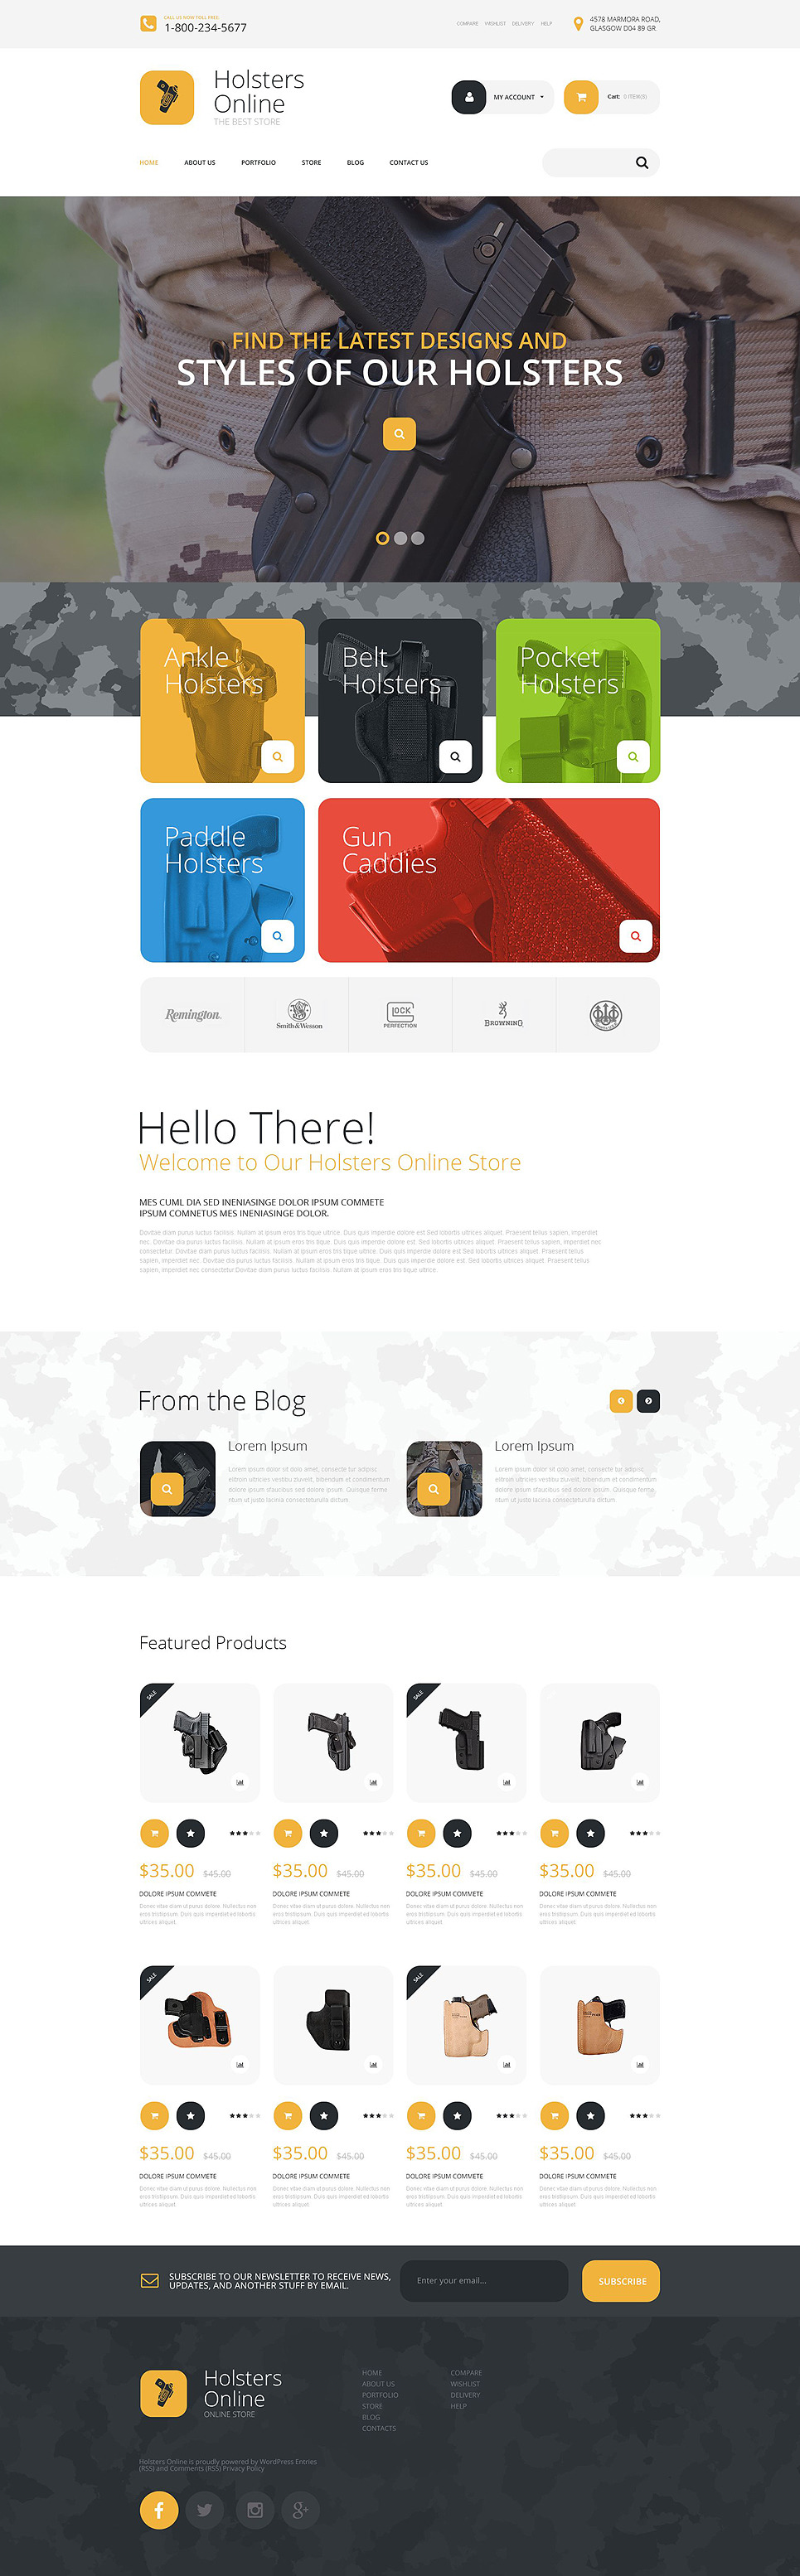 Holsters Online Store WooCommerce Theme New Screenshots BIG